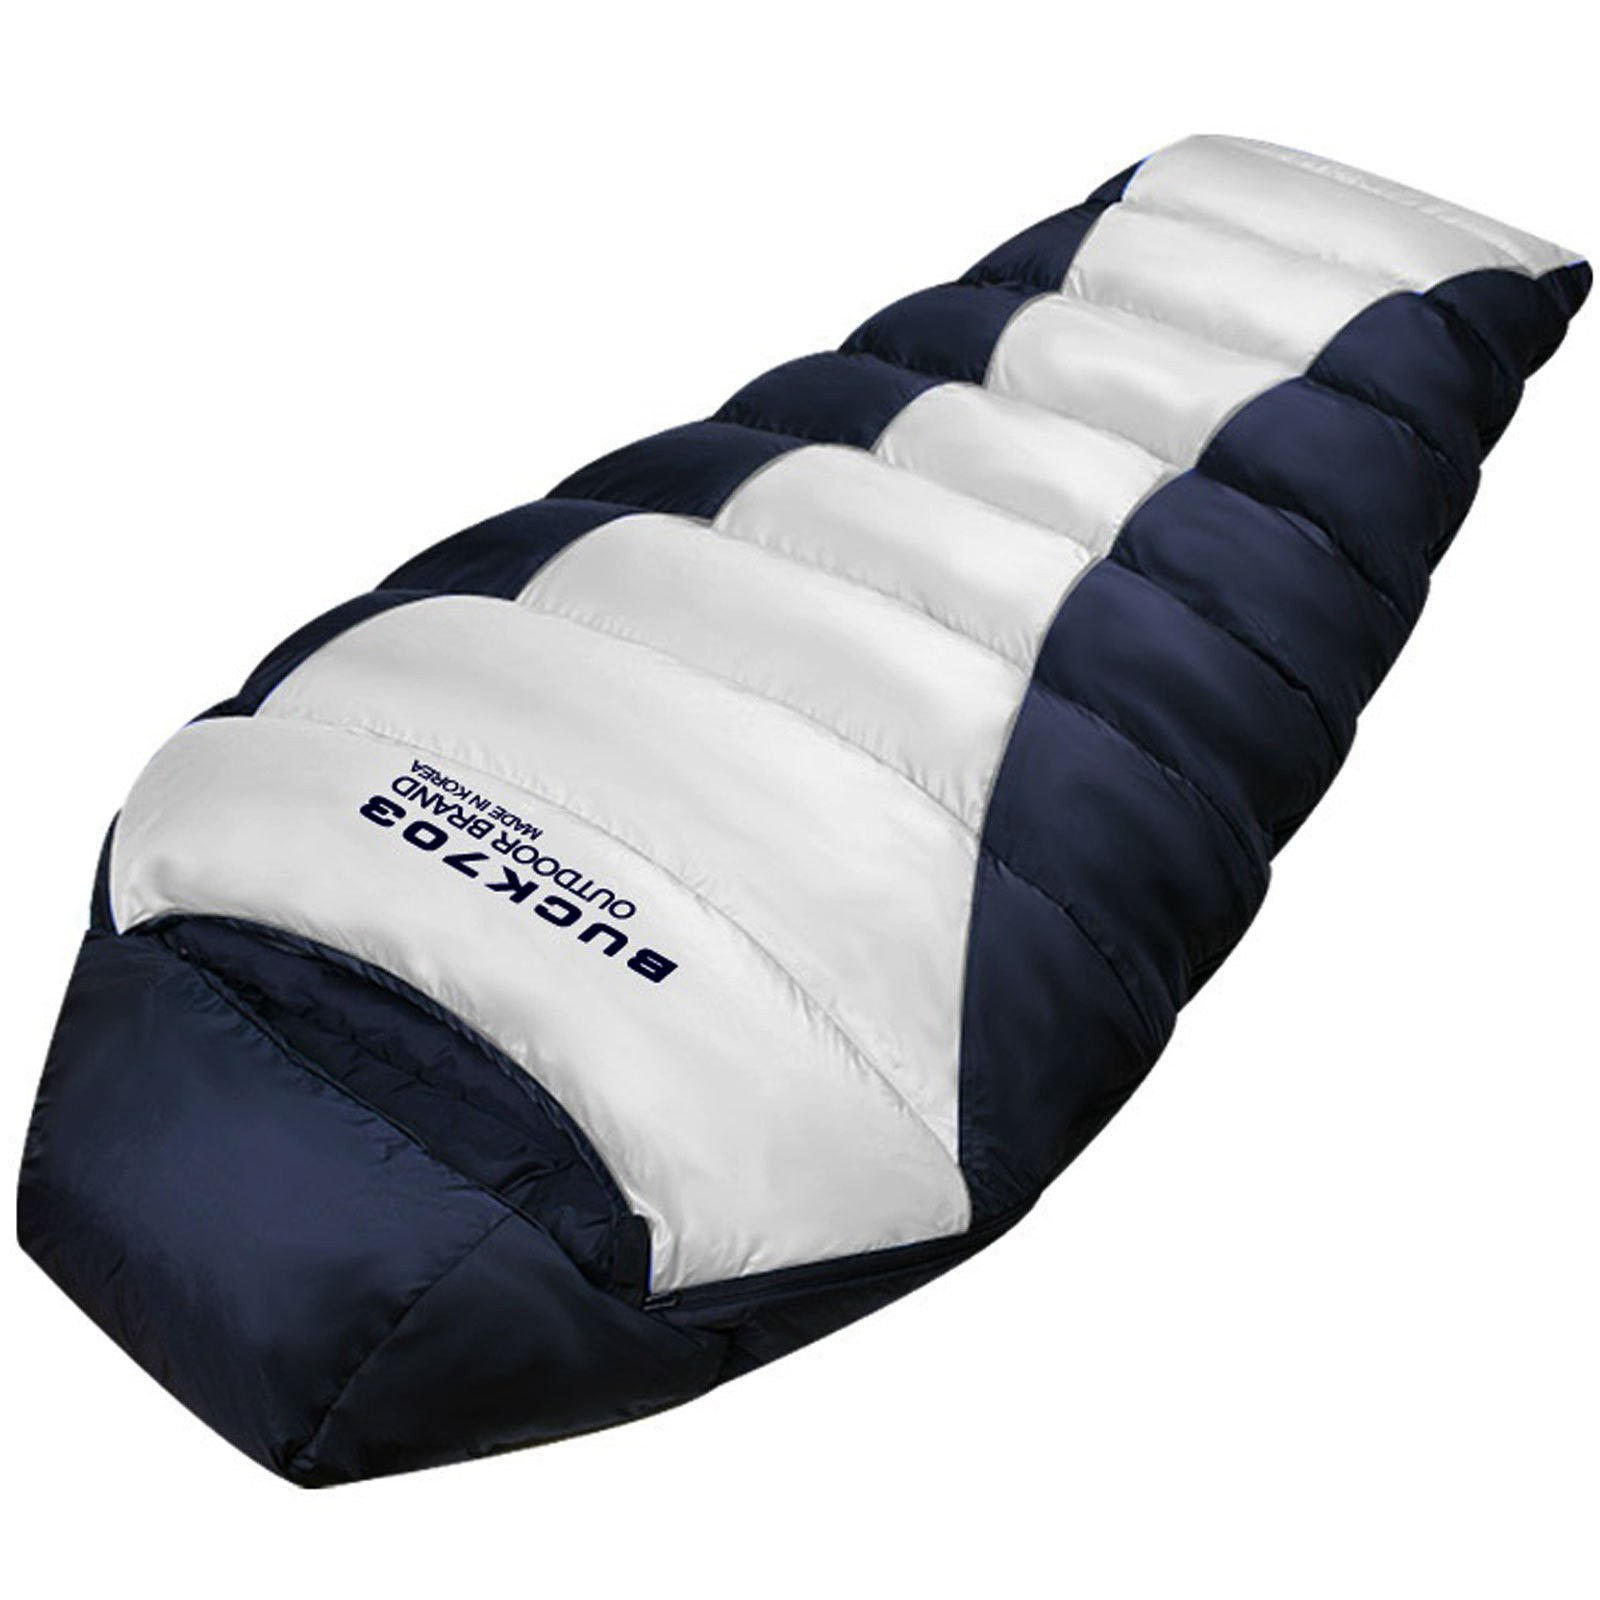 2XL Goose Down Sleeping Bag 4Season Backpacking Camping Lightweight Mummy Ultra